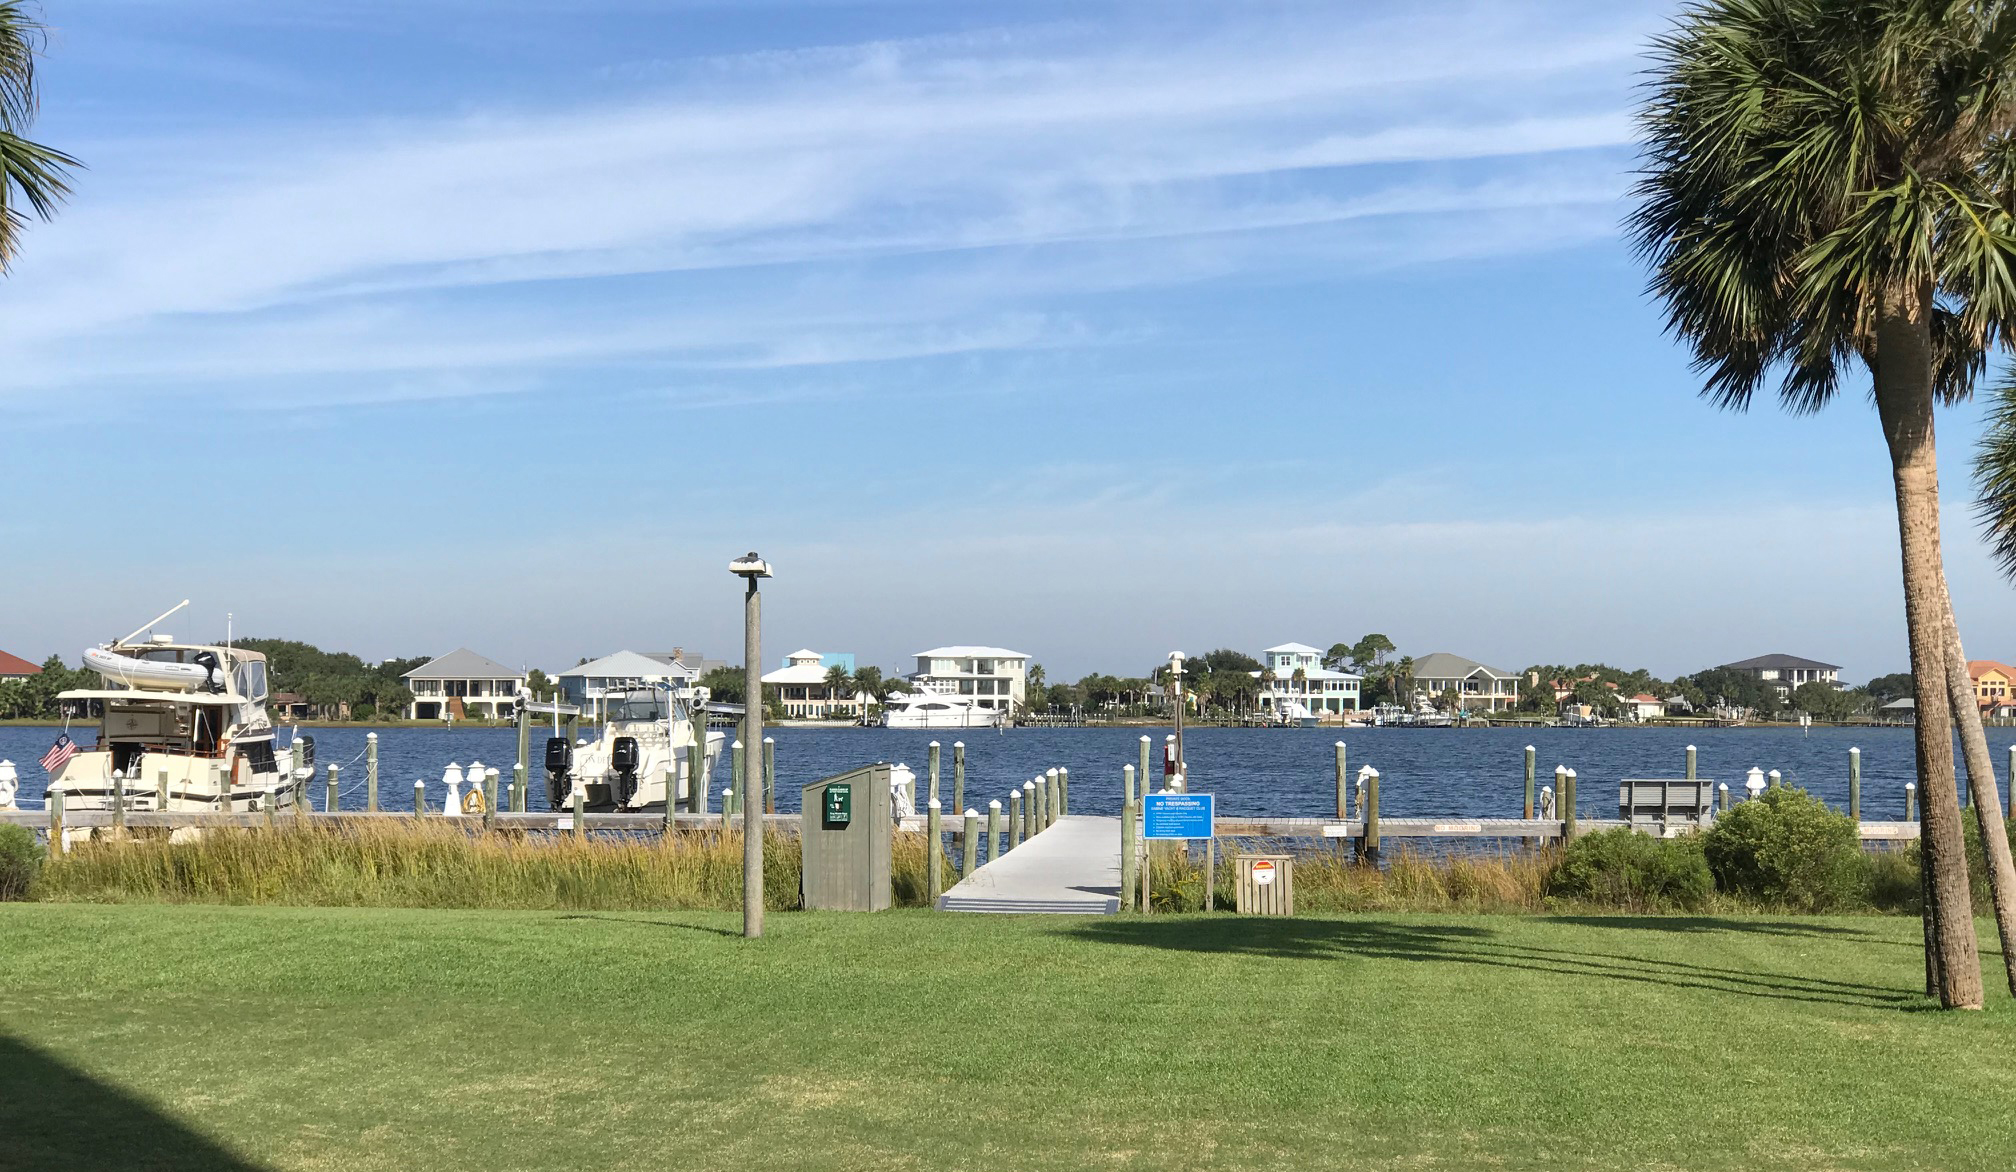 Sabine Yacht & Racquet Club #9D Condo rental in Sabine Yacht & Racquet Club ~ Pensacola Beach Condo Rentals by BeachGuide in Pensacola Beach Florida - #32